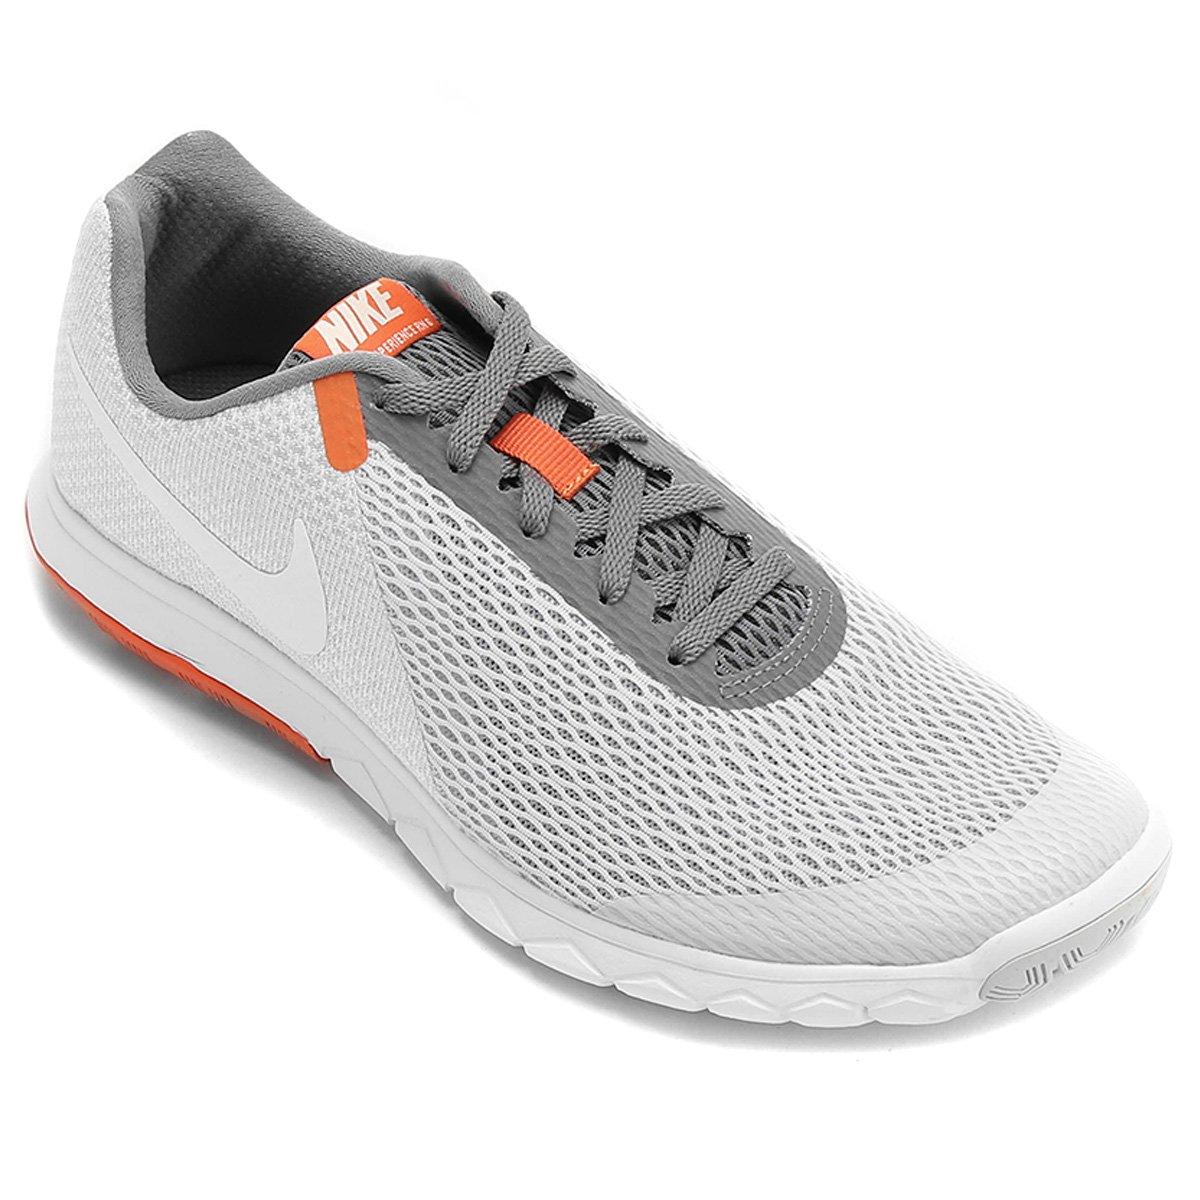 Tênis Nike Flex Experience Rn 6 Masculino - Cinza e Branco - Compre ... 62b01178ad264